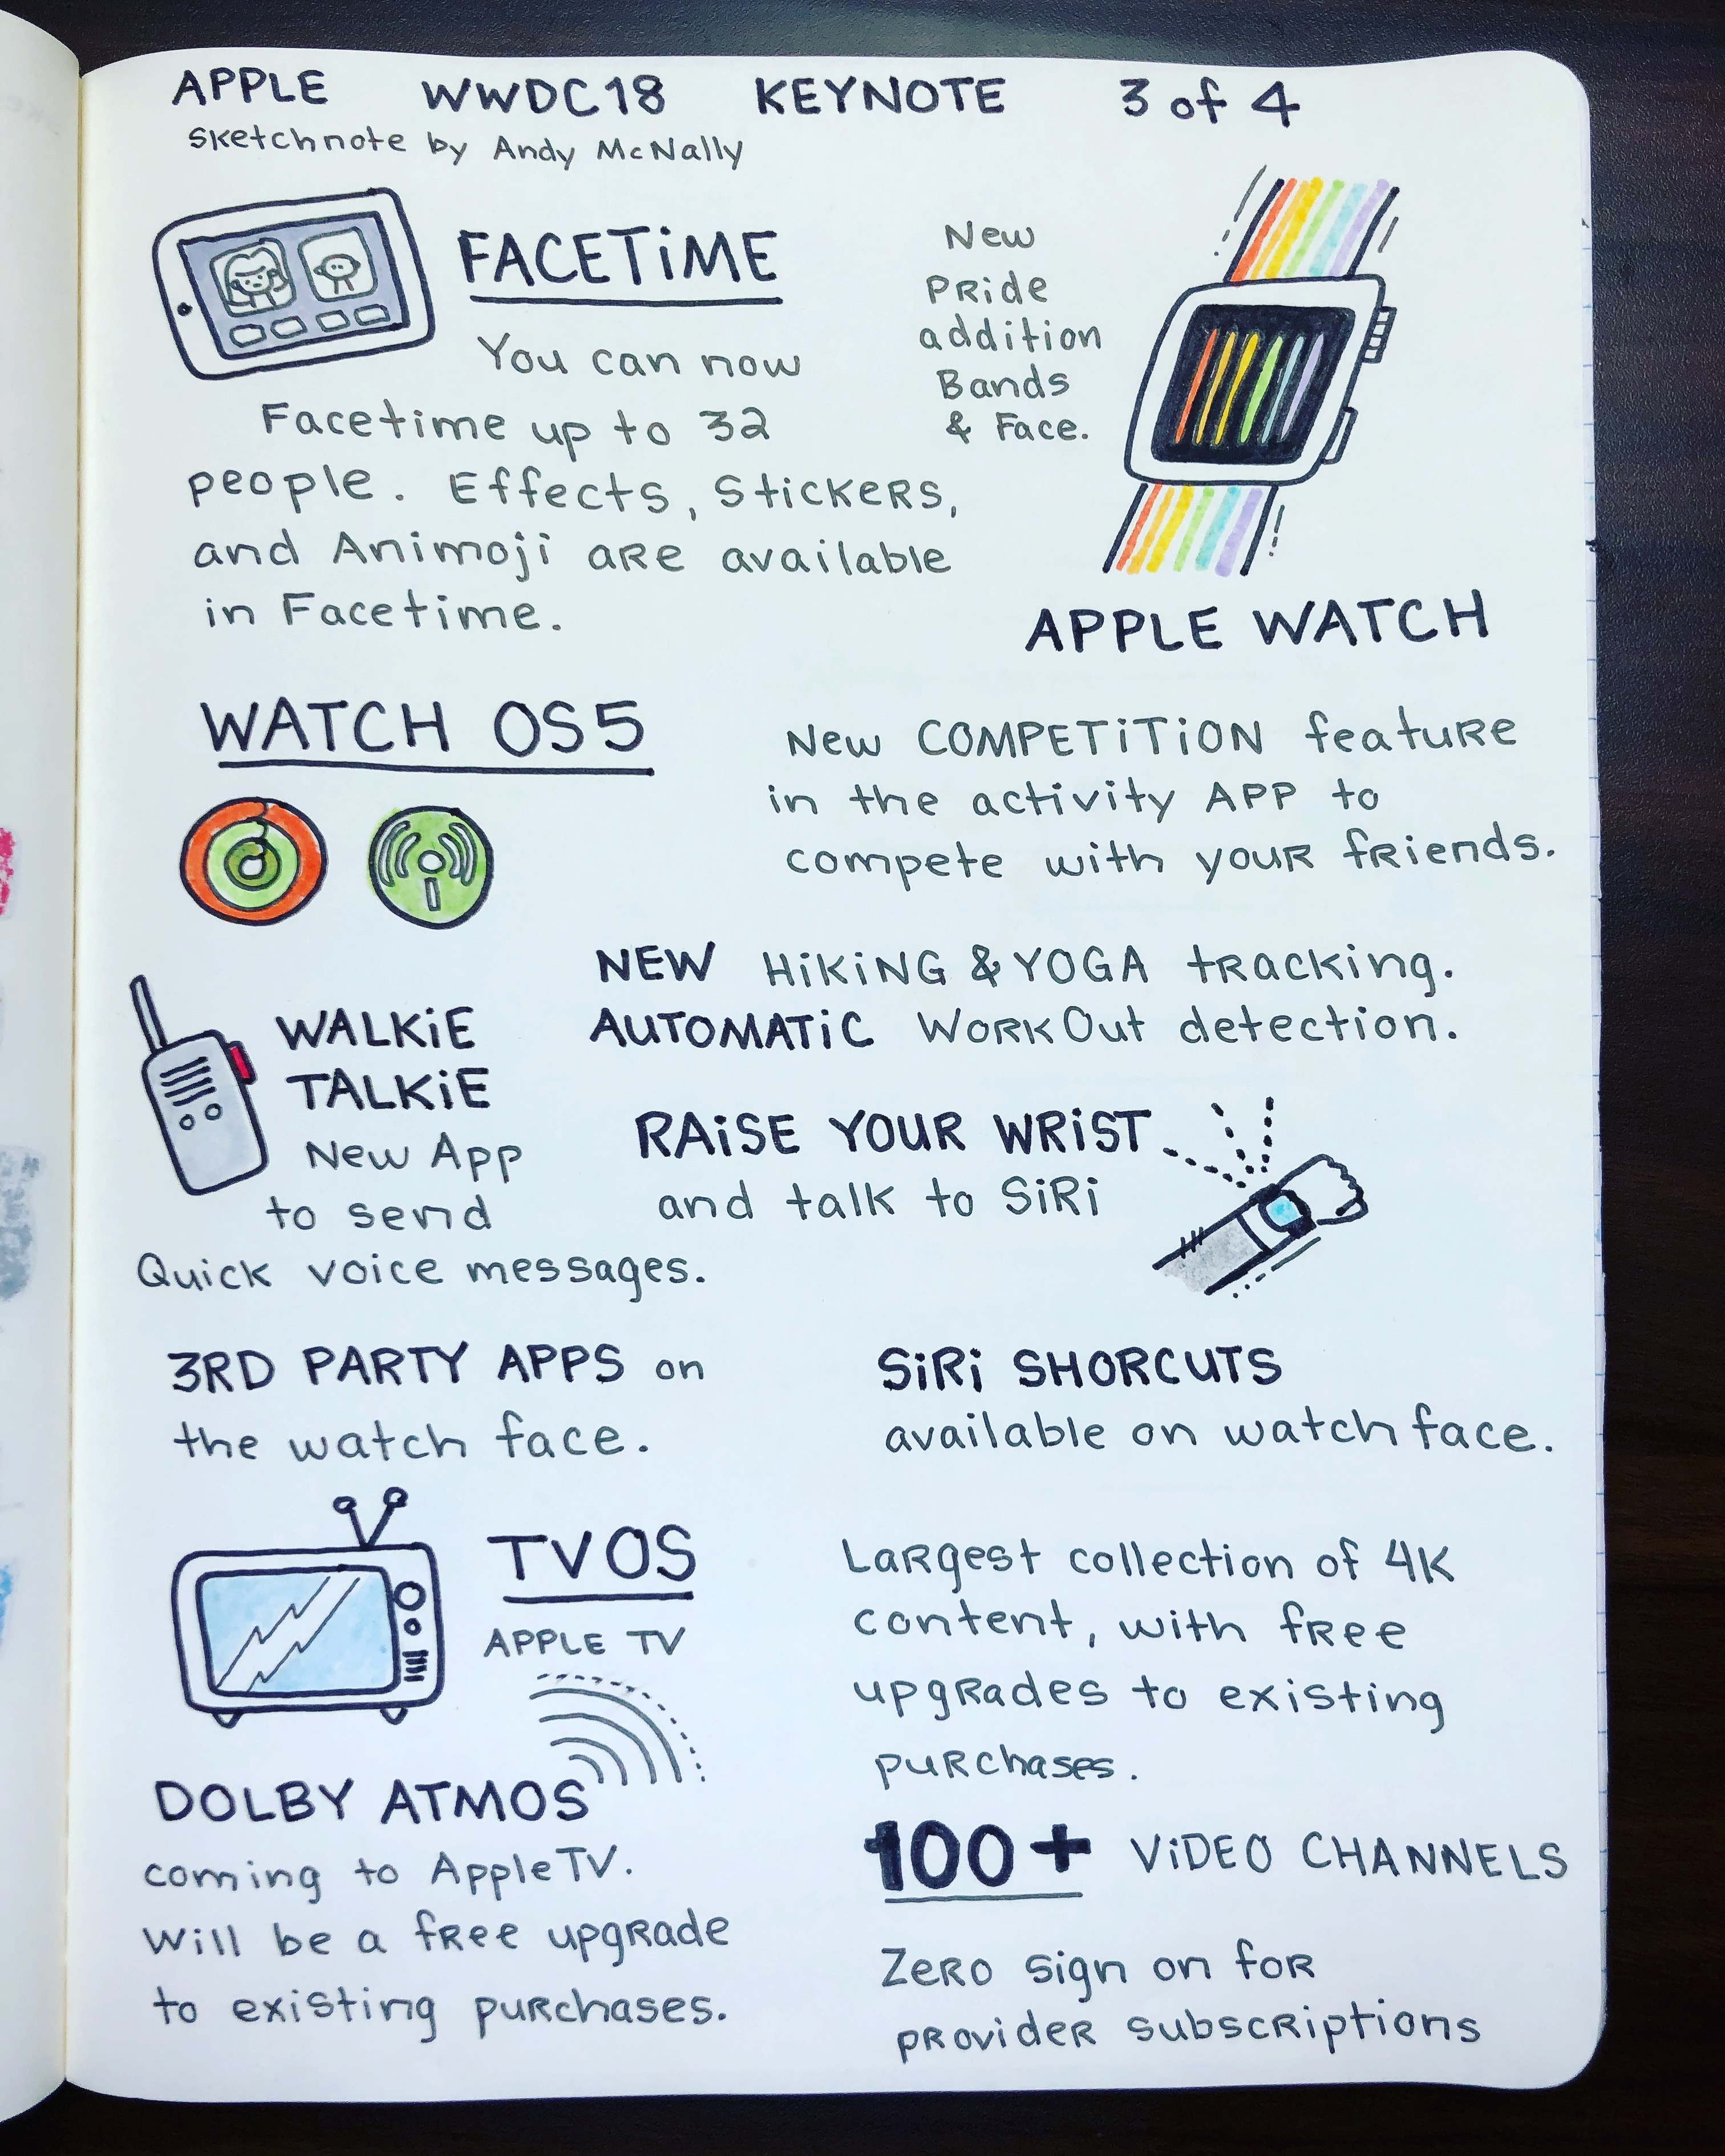 Apple WWDC 2018 Sketchnotes 3 of 4